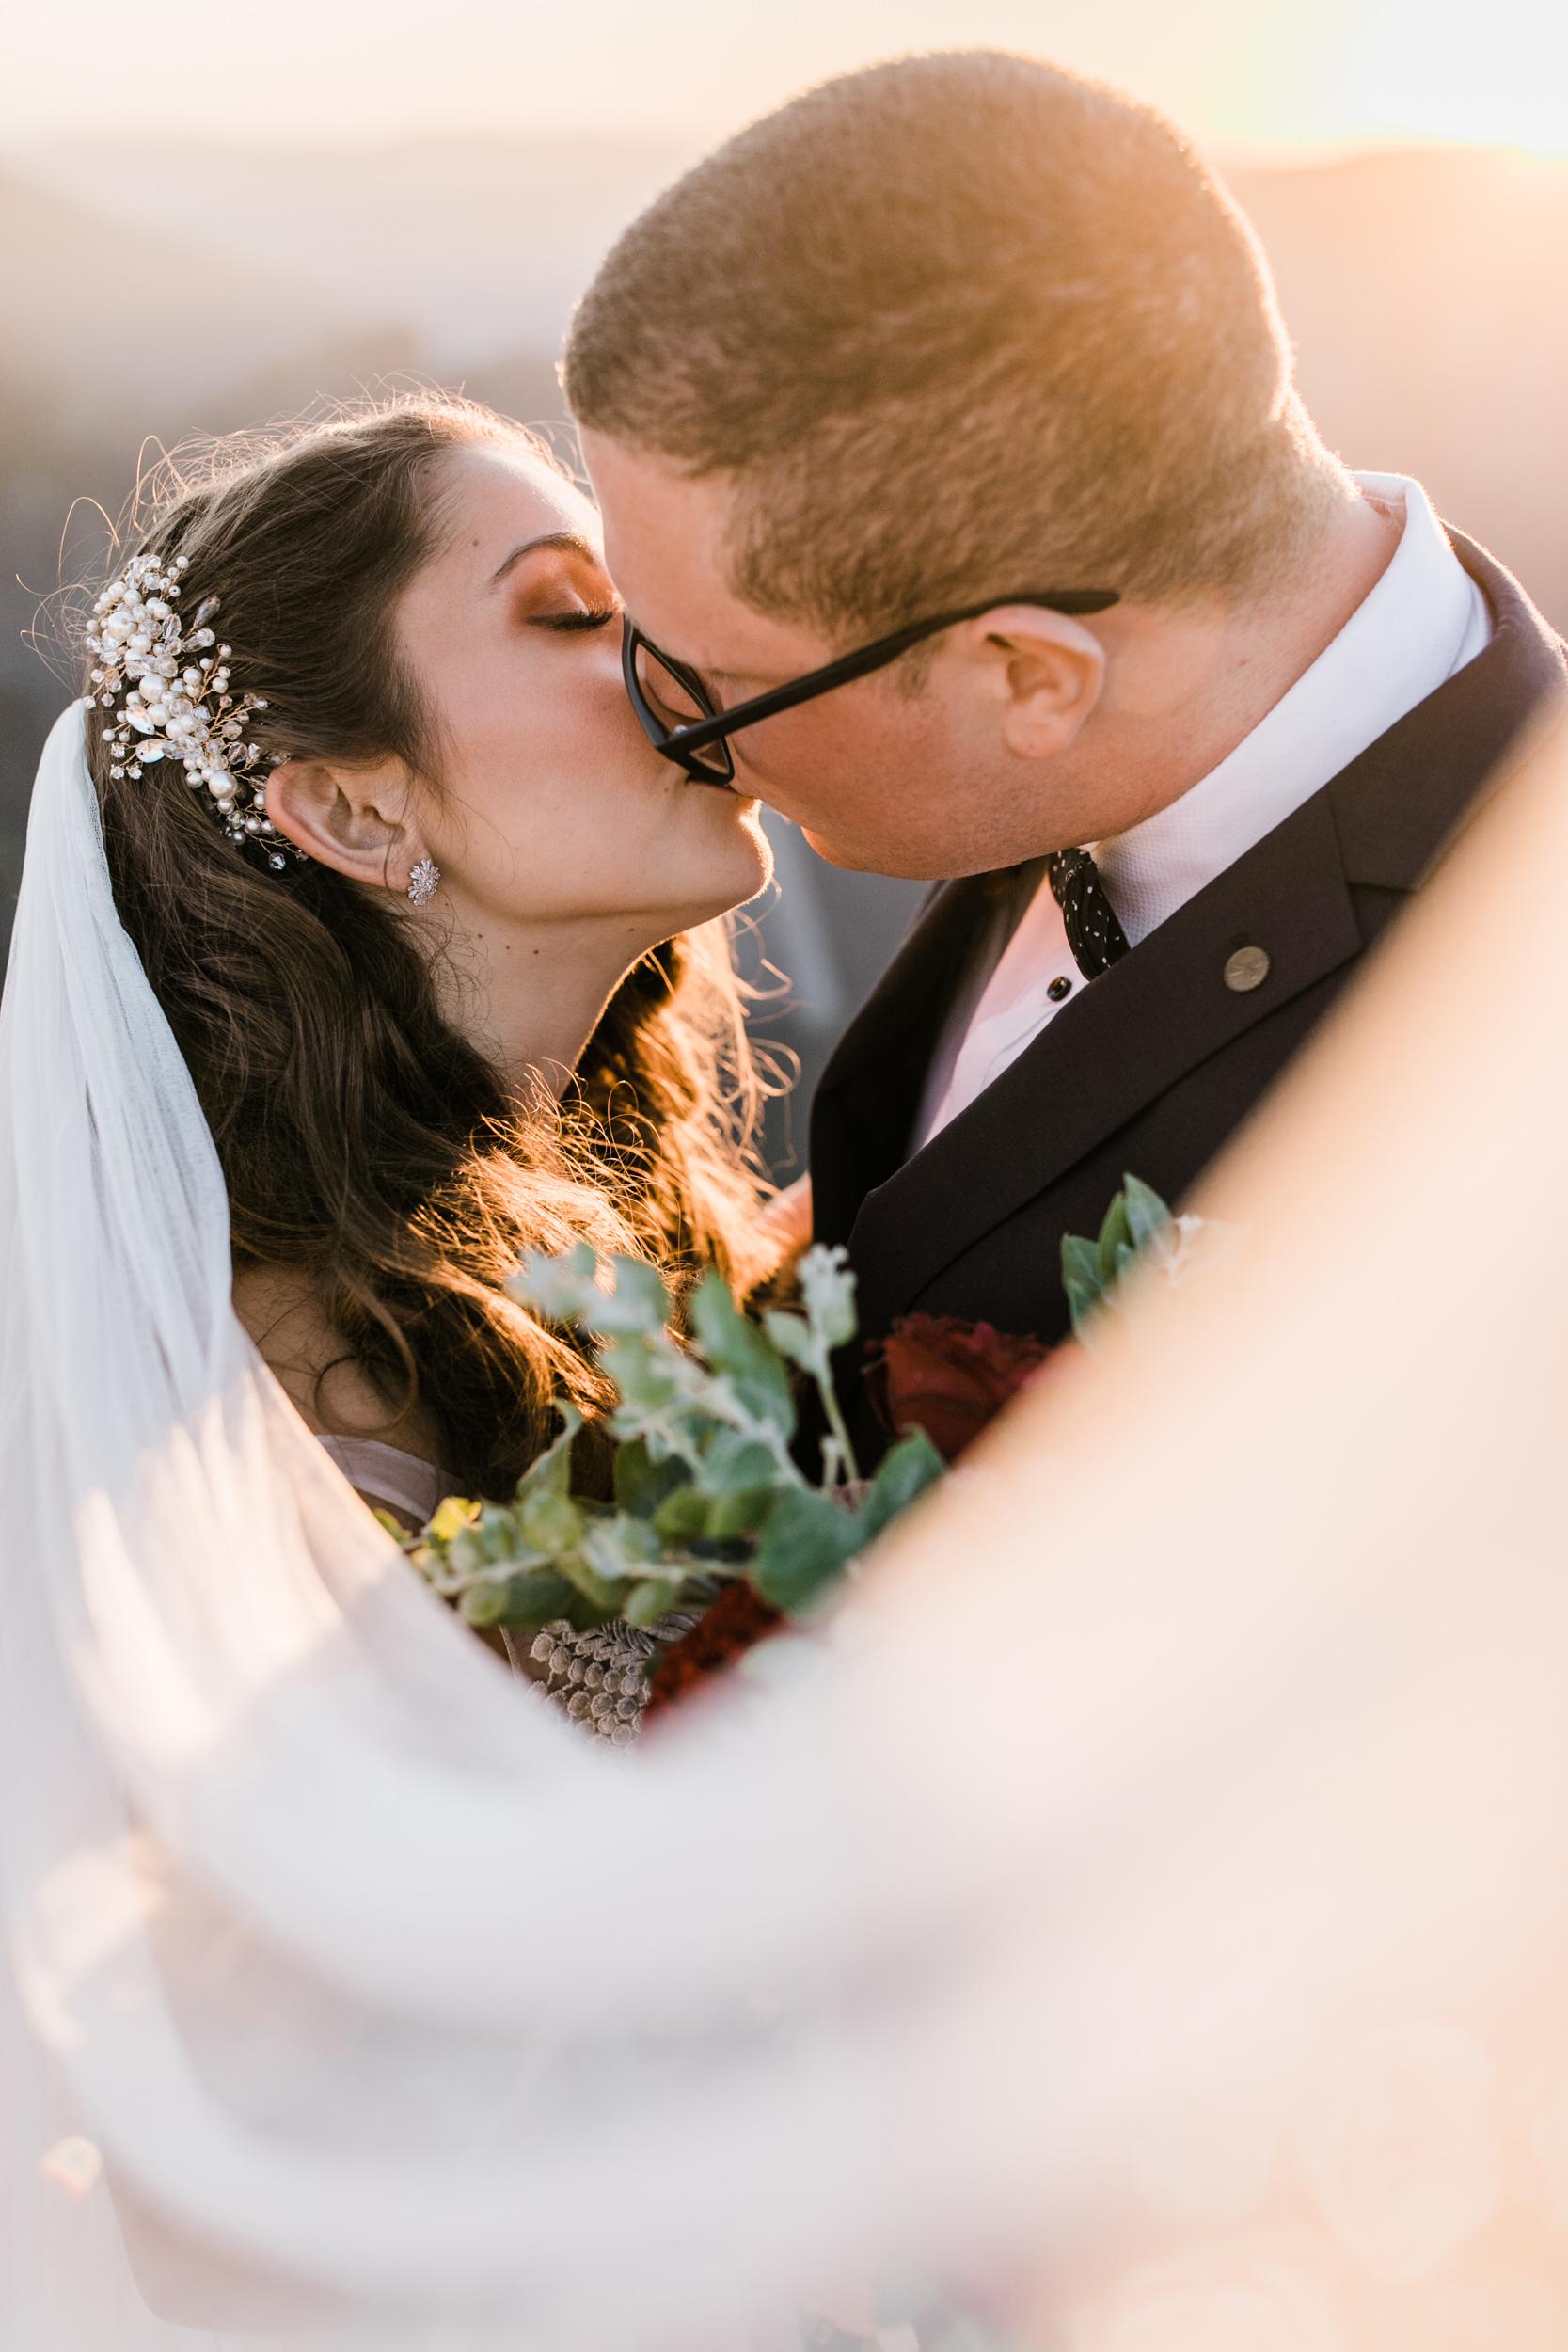 destination elopement in yosemite valley | adventure wedding portraits + a romantic ceremony | national park elopement photographer | the hearnes adventure photography